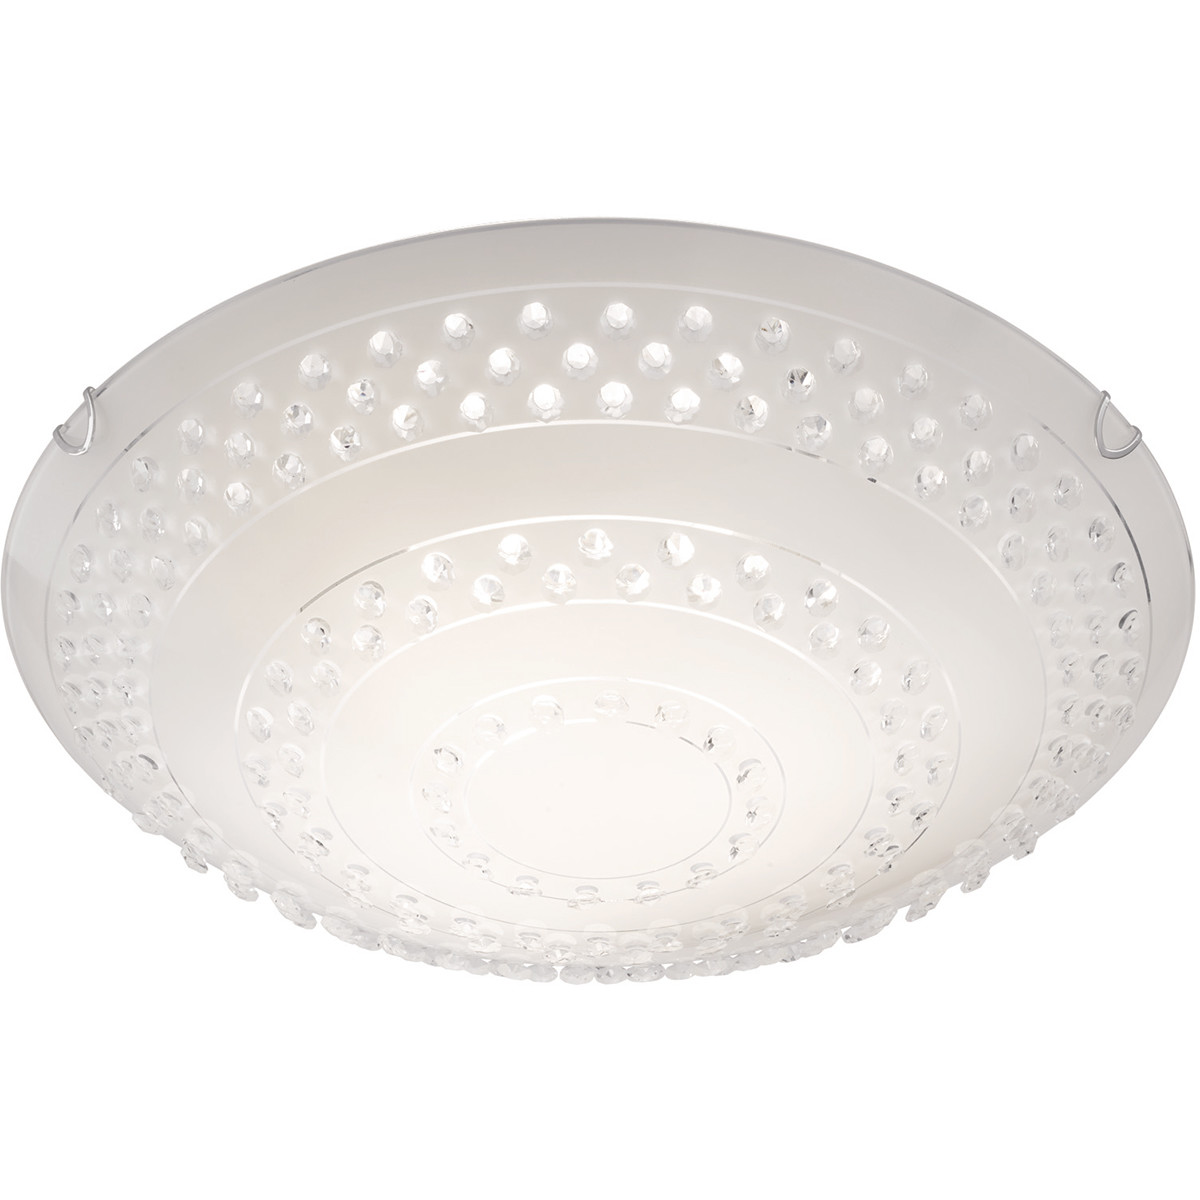 LED Plafondlamp - Plafondverlichting - Trion Crasto - E27 Fitting - 3-lichts - Rond - Mat Wit - Alum